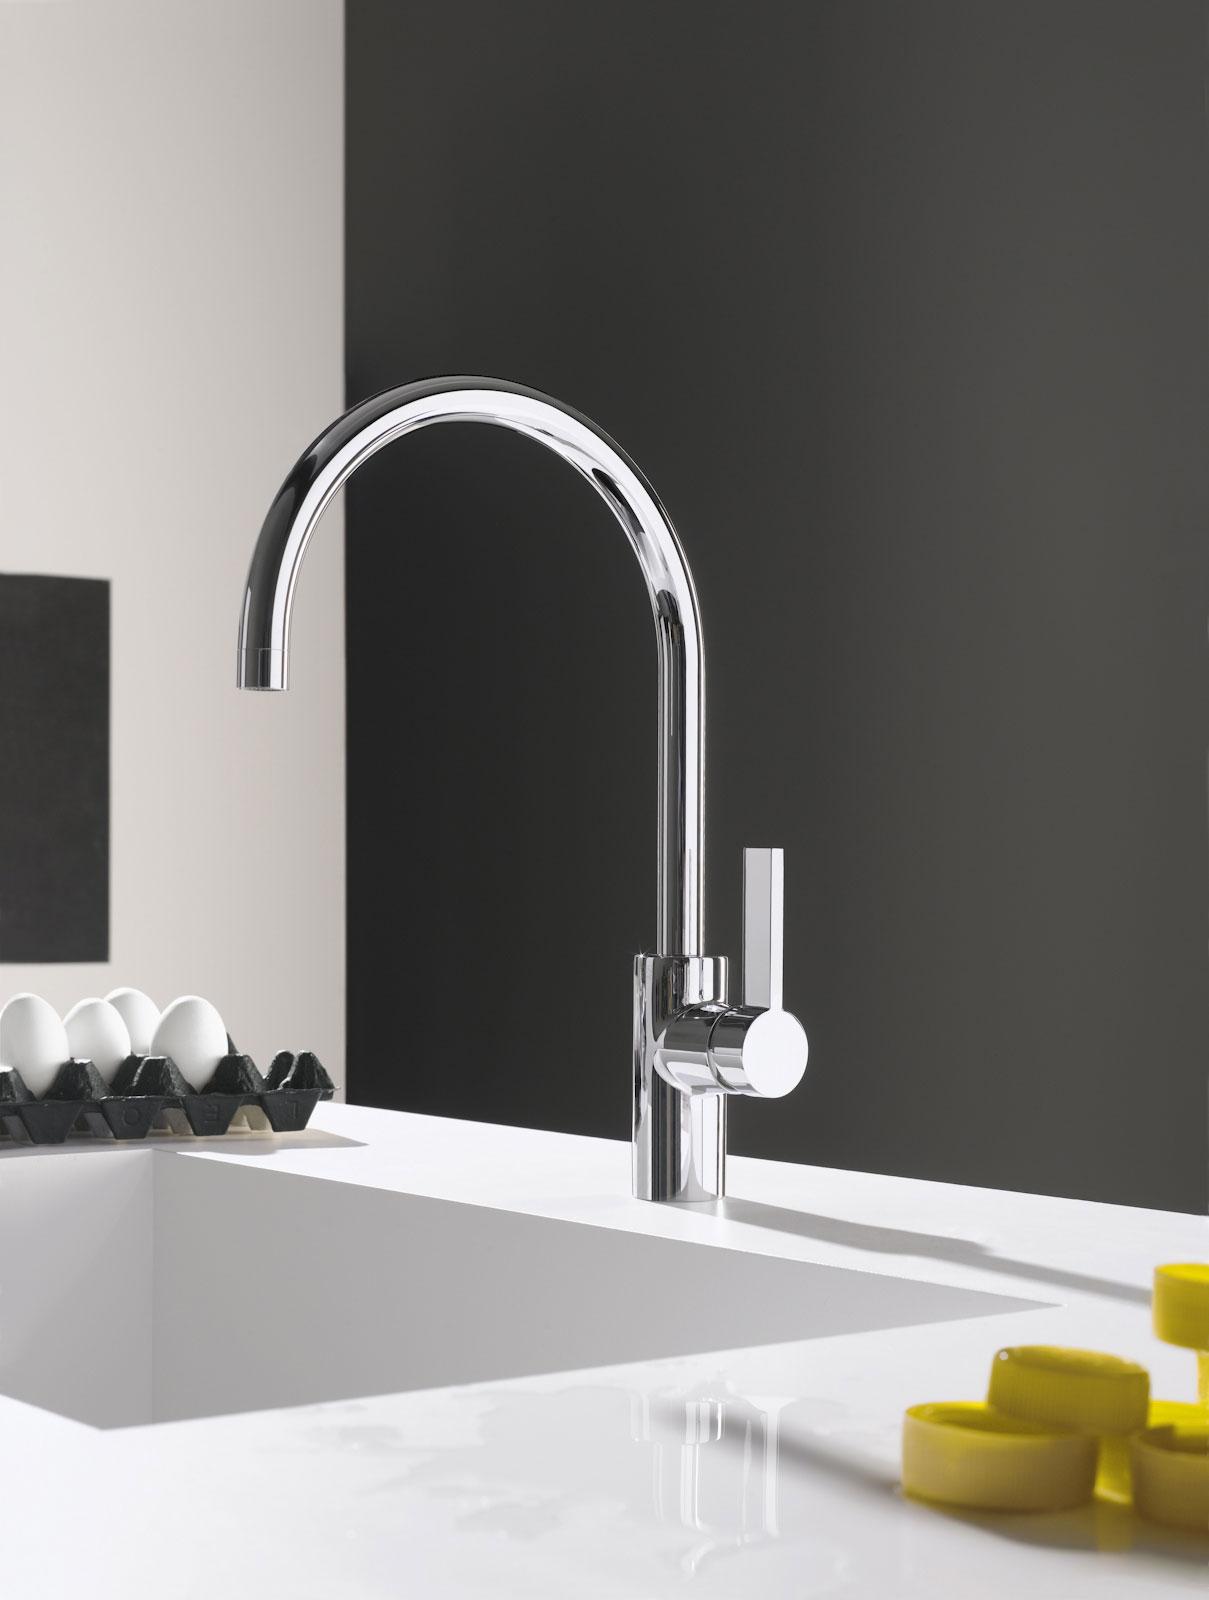 Ideas, dornbracht bathroom faucets bathroom faucet and bench ideas regarding size 1209 x 1600  .